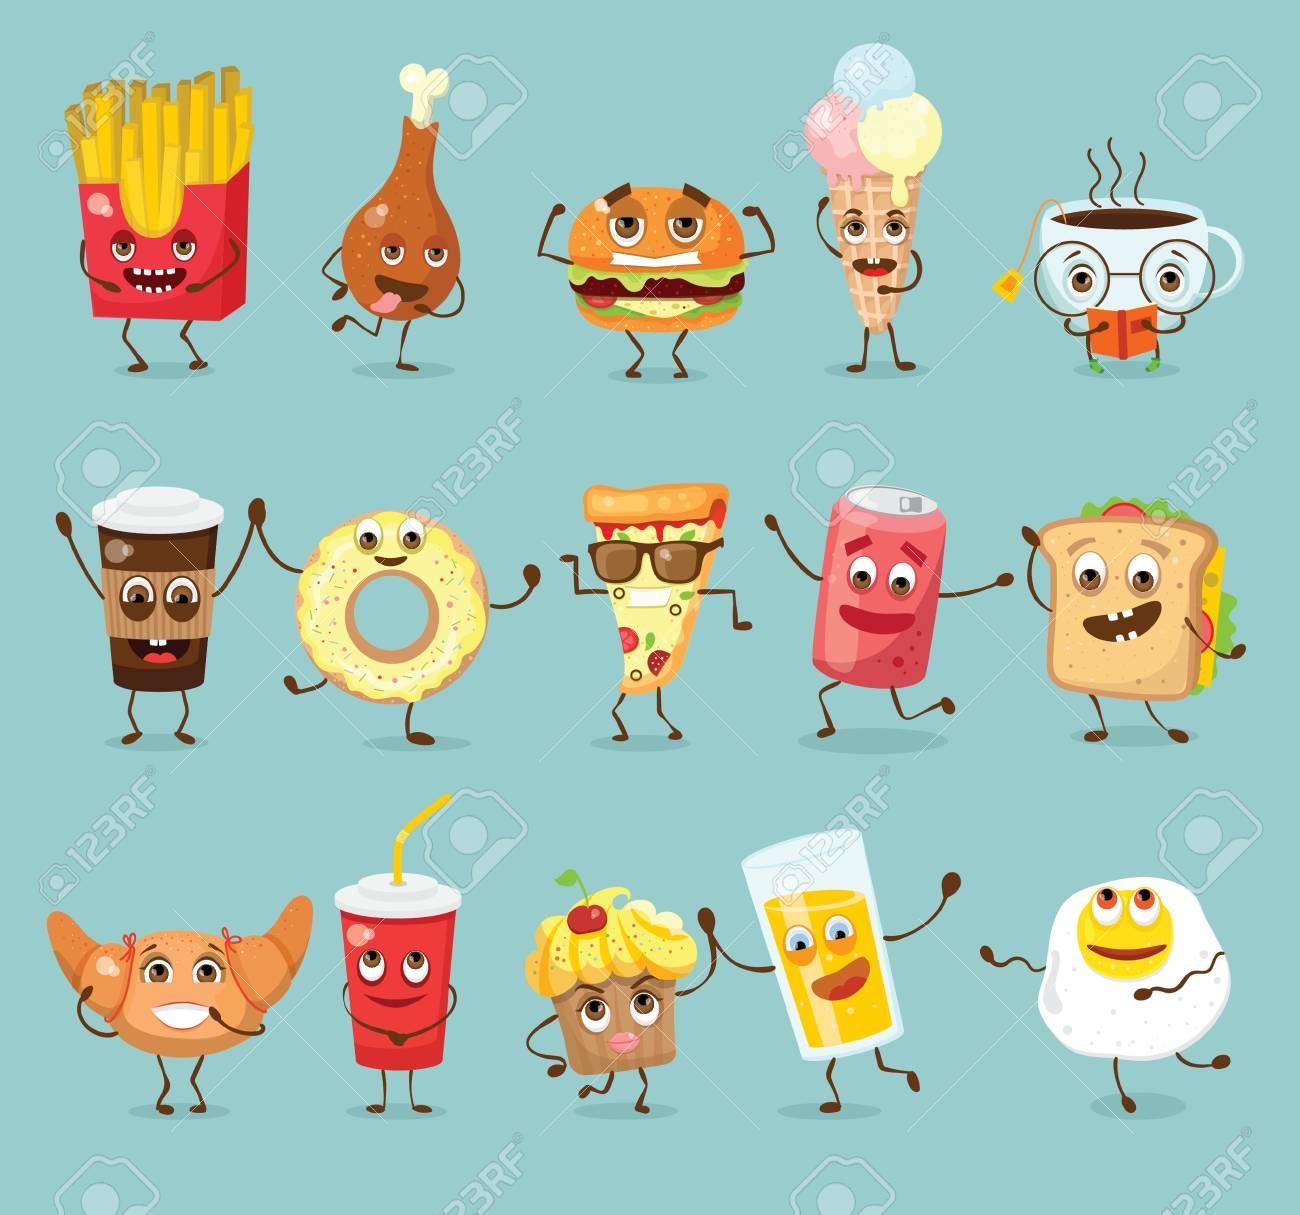 Cartoon funny food characters illustrations..